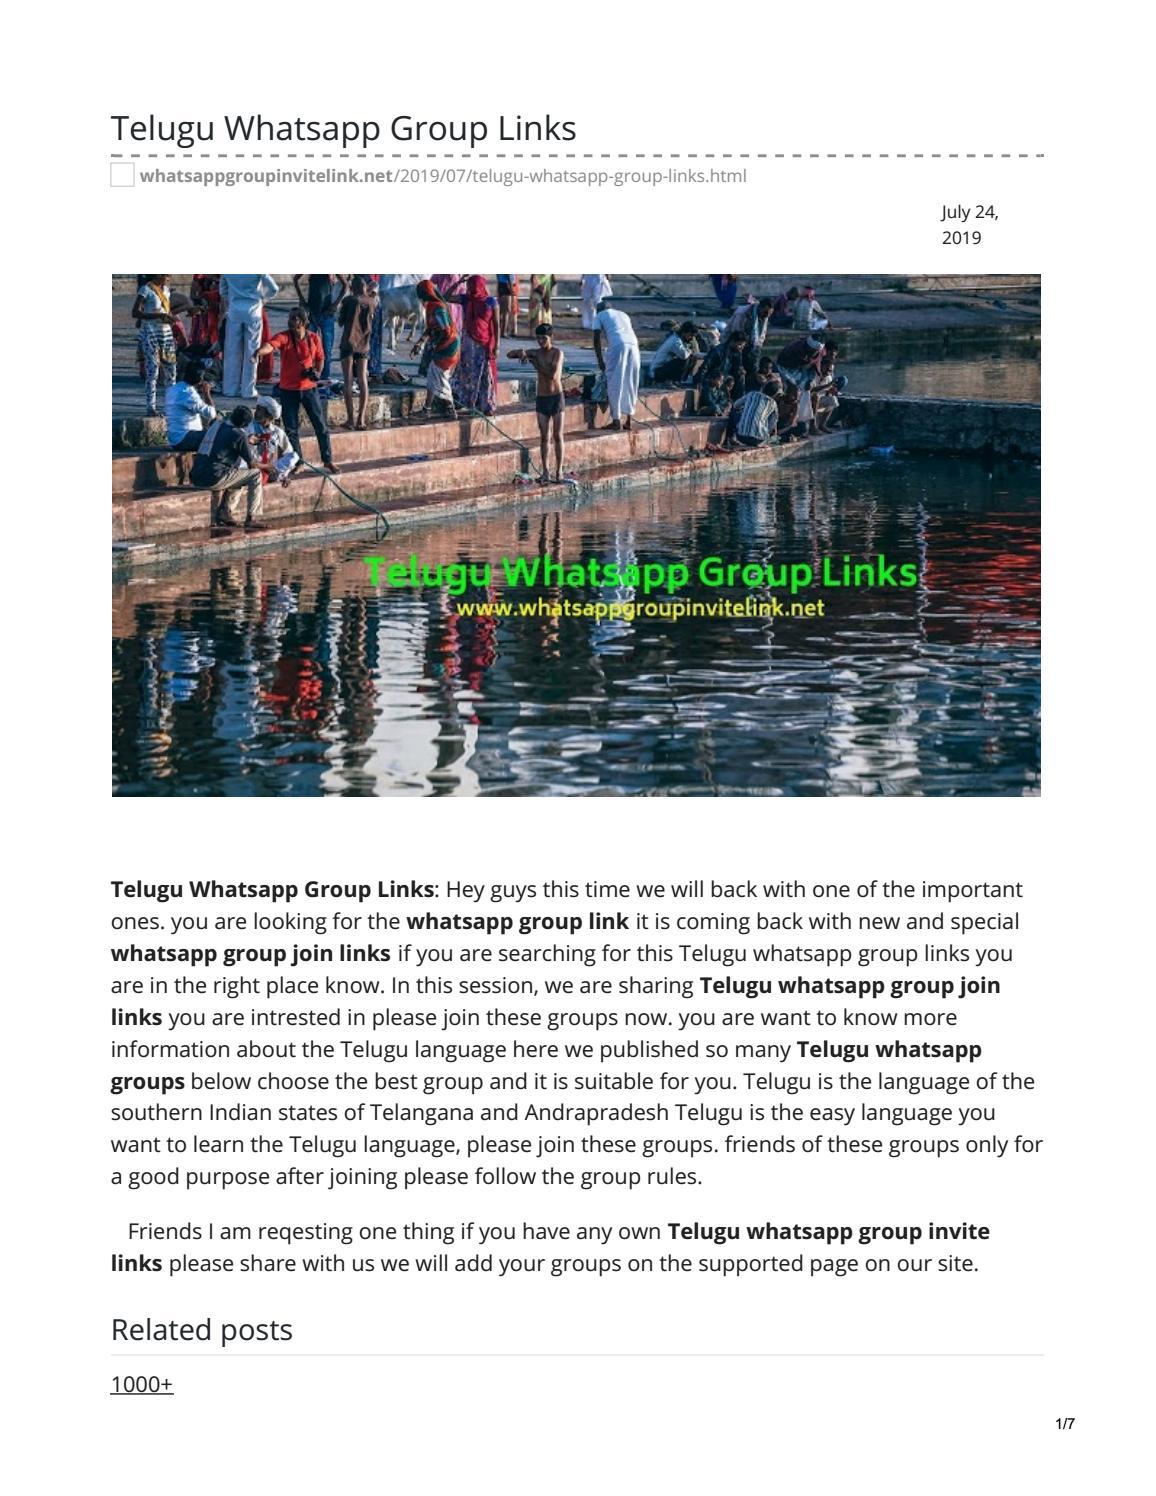 Telugu Whatsapp Group Links by whatsappgrouplink77 - issuu